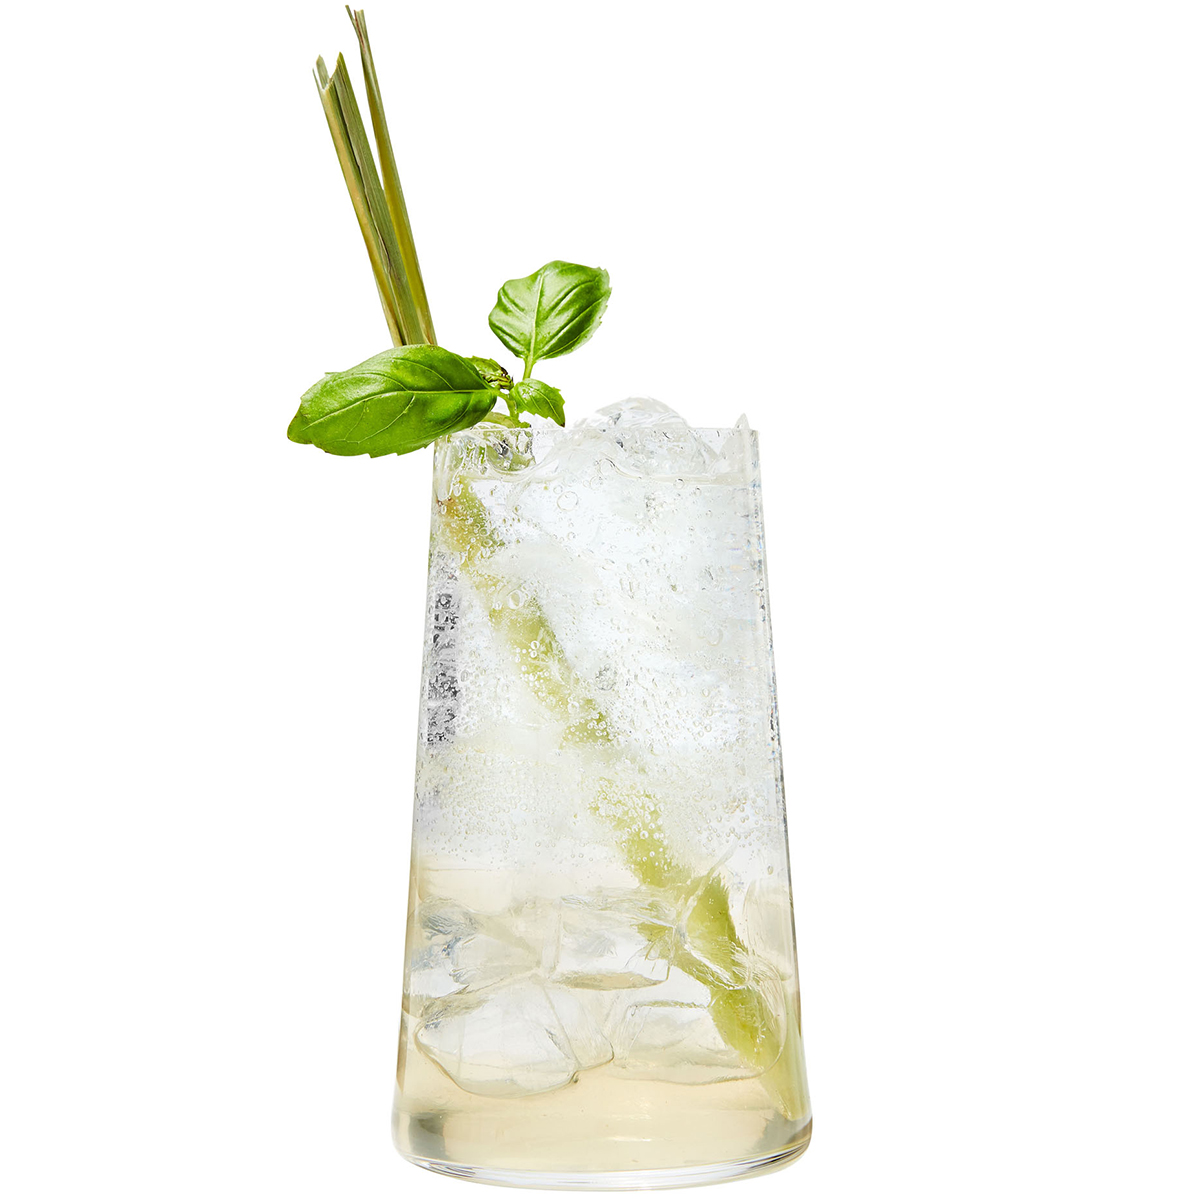 lemongrass and basil soda